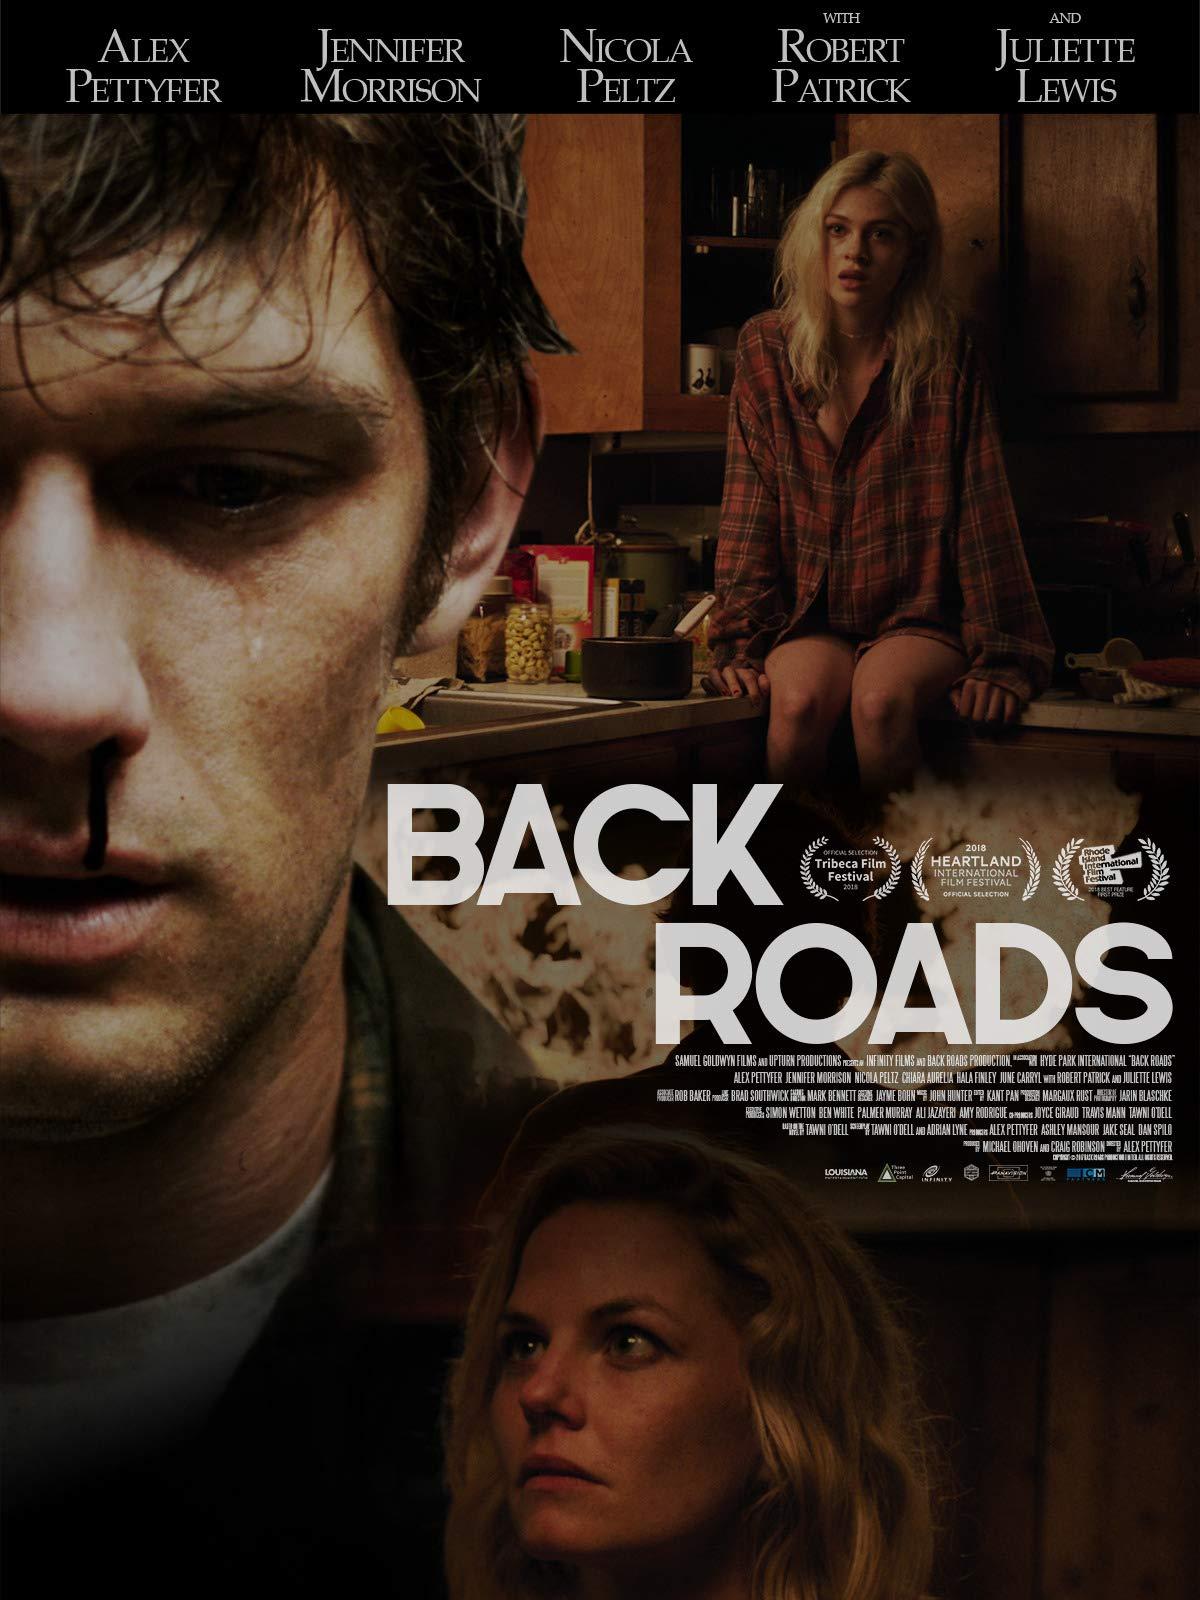 Amazon.com: Back Roads: Alex Pettyfer, Jennifer Morrison, Nicola ...